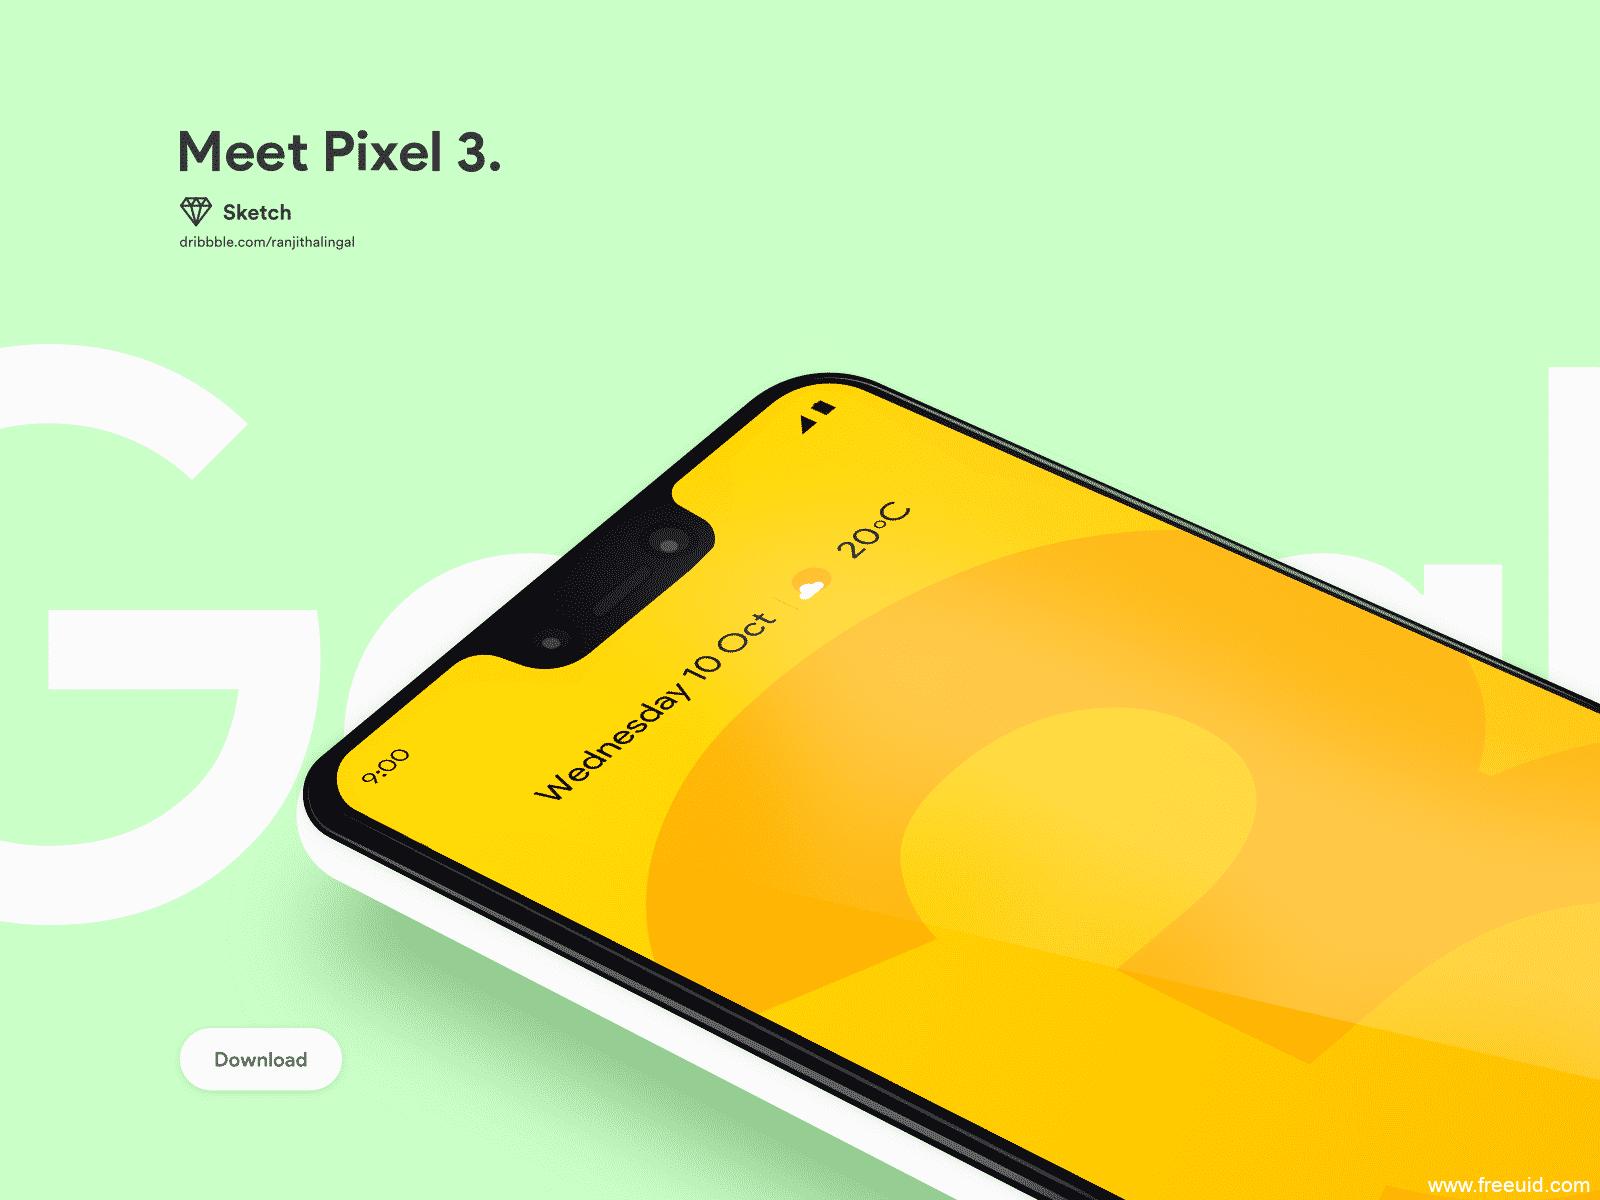 Pixel 3手机模板,UI素材下载,机型模板下载,sketch源文件